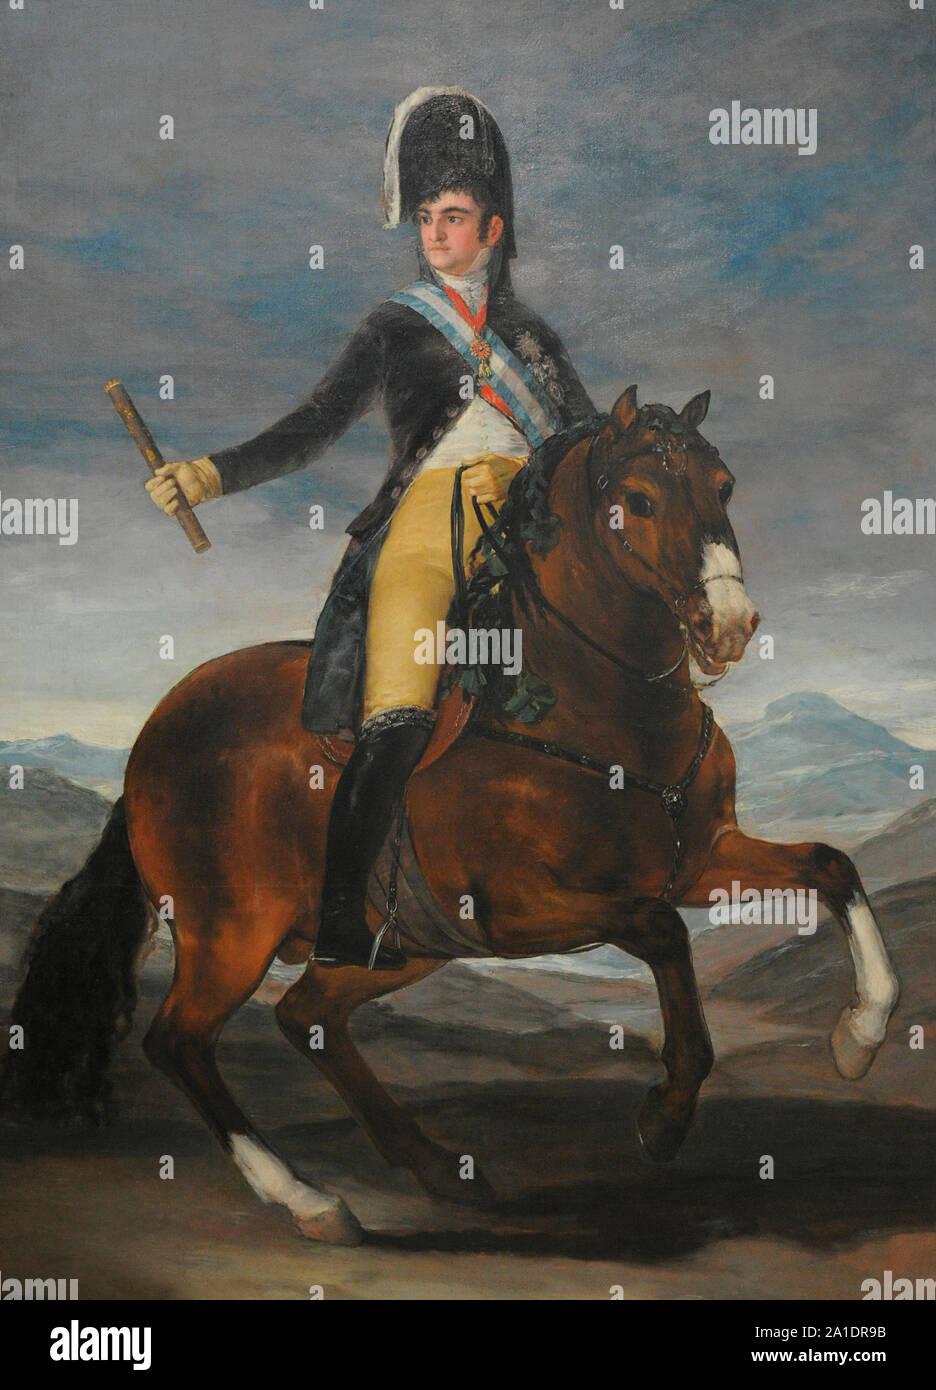 Ferdinand VII (1784-1833). King of Spain (1808-1833). Equestrian portrait of Ferdinand VII, 1808. By Francisco de Goya y Lucientes (1746-1828). San Fernando Royal Academy of Fine Arts. Madrid. Spain. Stock Photo